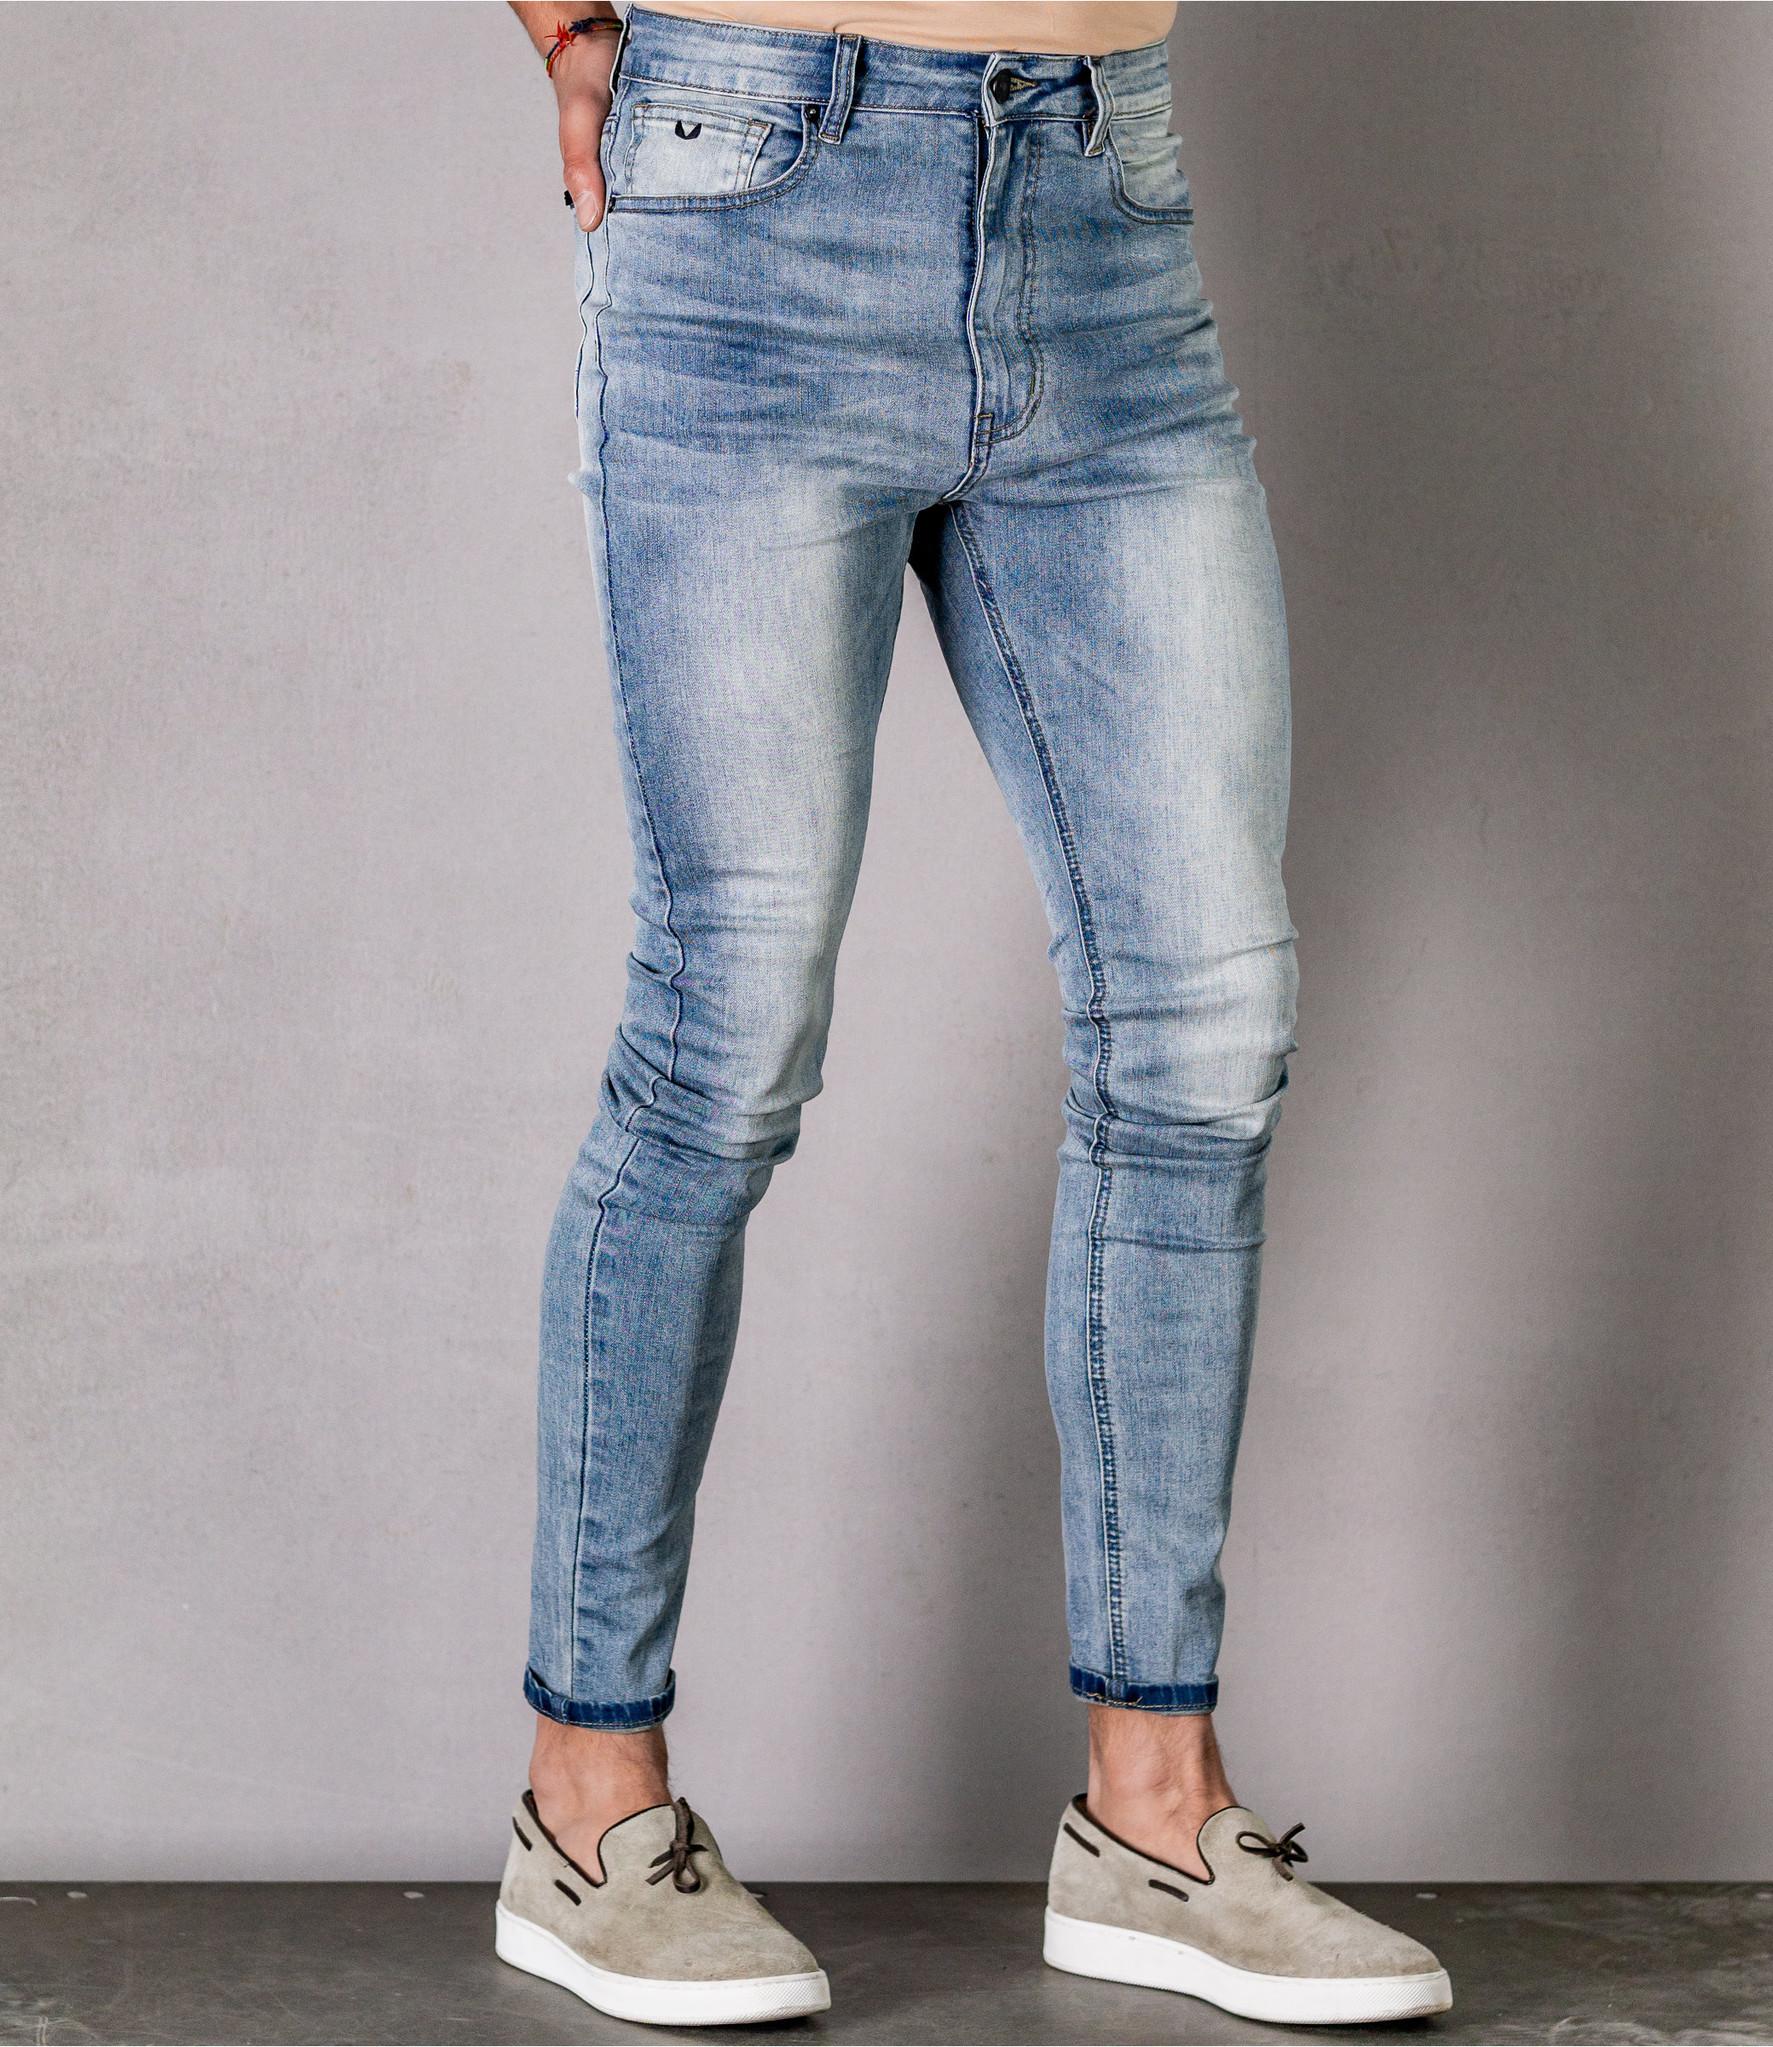 Zumo-Jeans-KIRK-Dirty-BLue